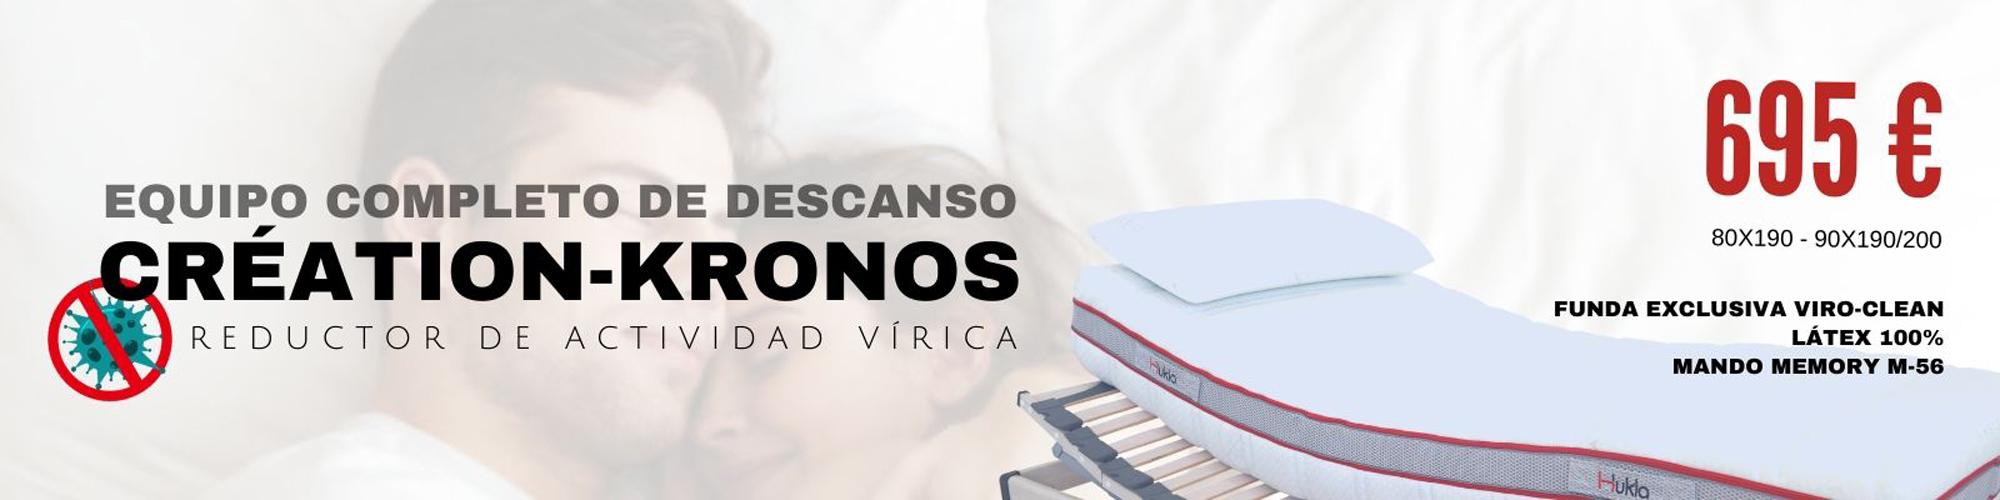 Pack Création - Kronos H56 MF